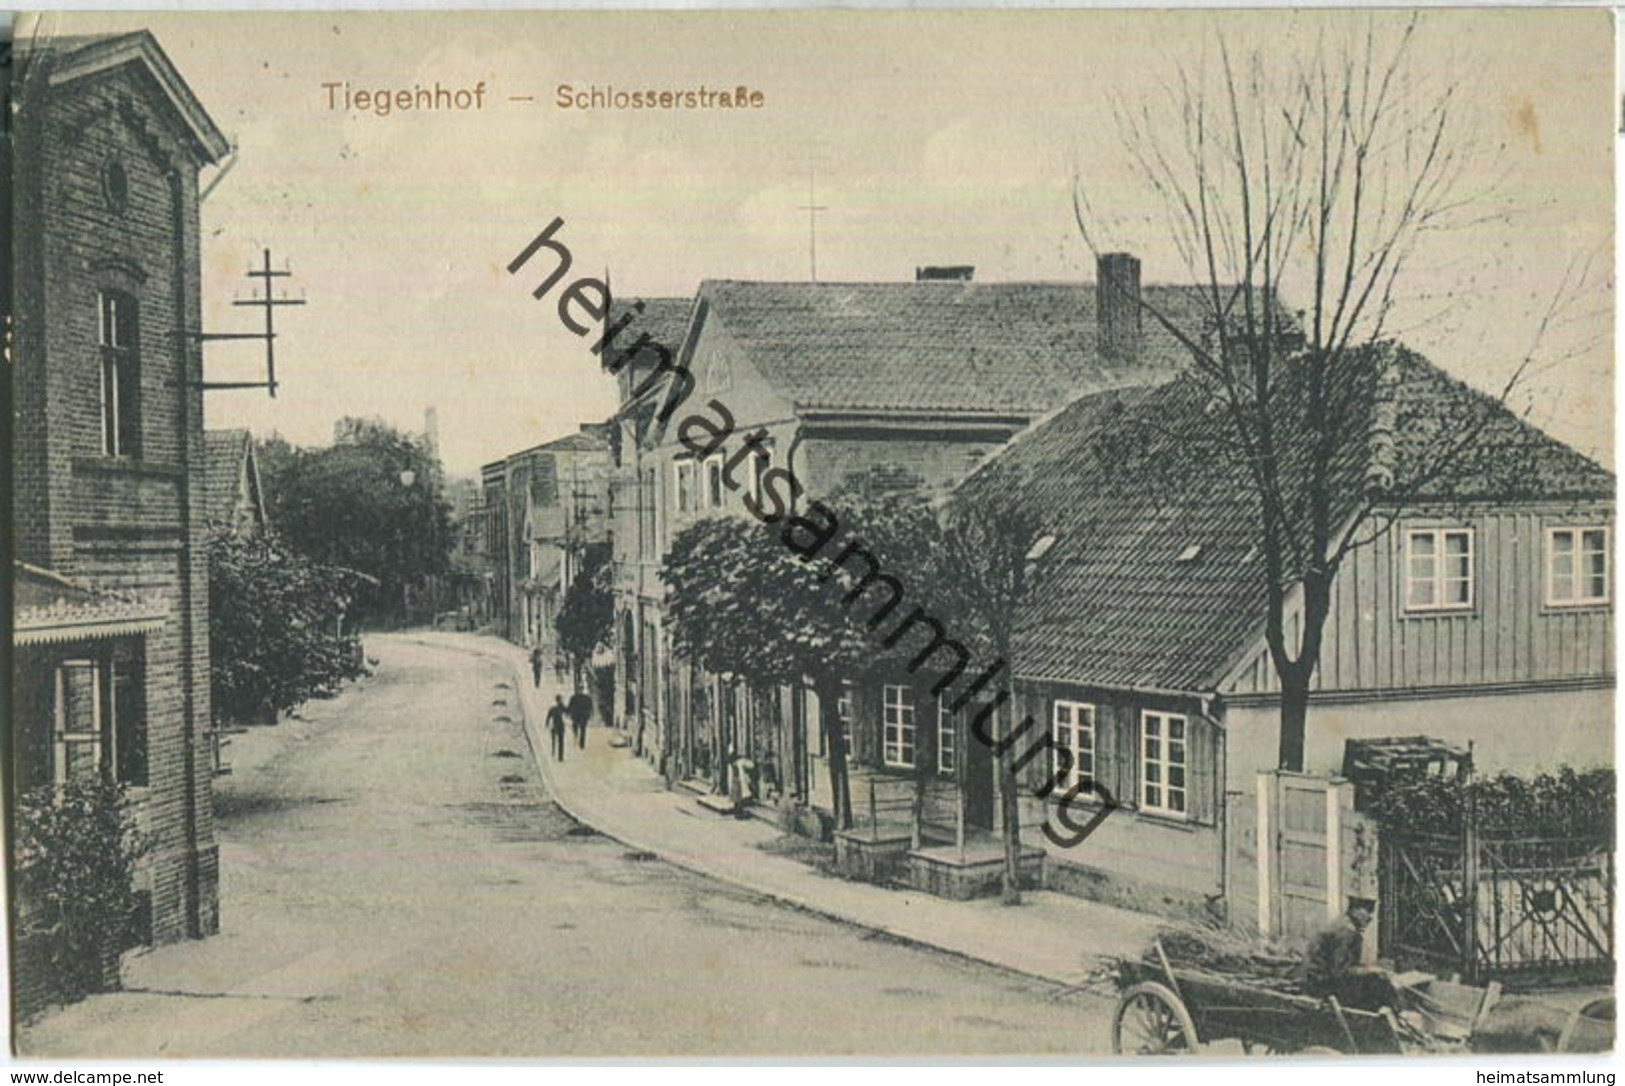 Nowy Dwor Gdanski - Tiegenhof - Schlosserstrasse - Verlag Leop. Zehrun Tiegenhof - Westpreussen